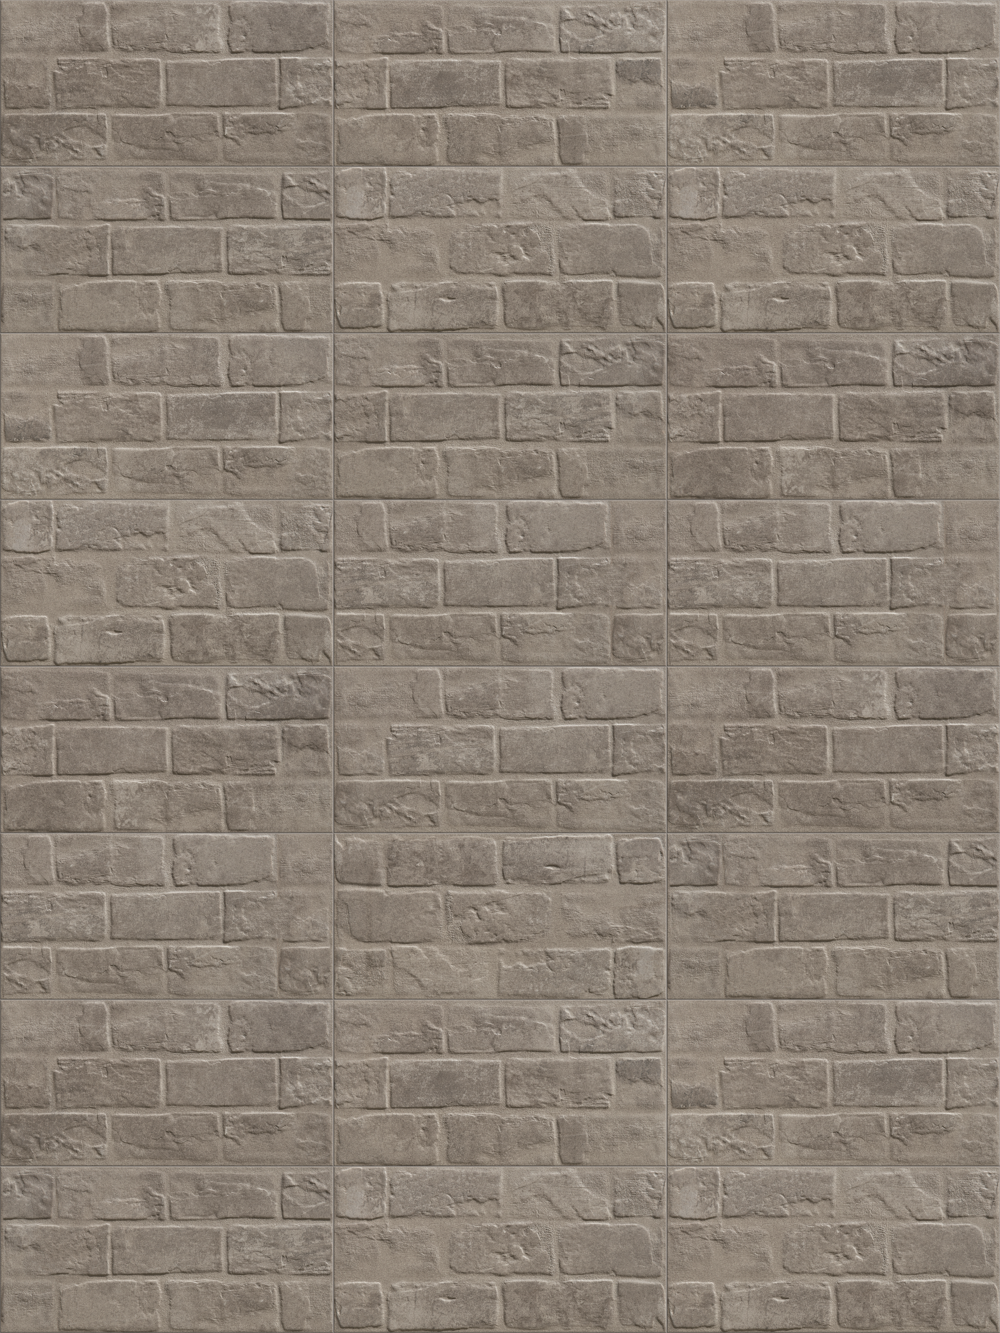 CHESTNUT_Brick.png